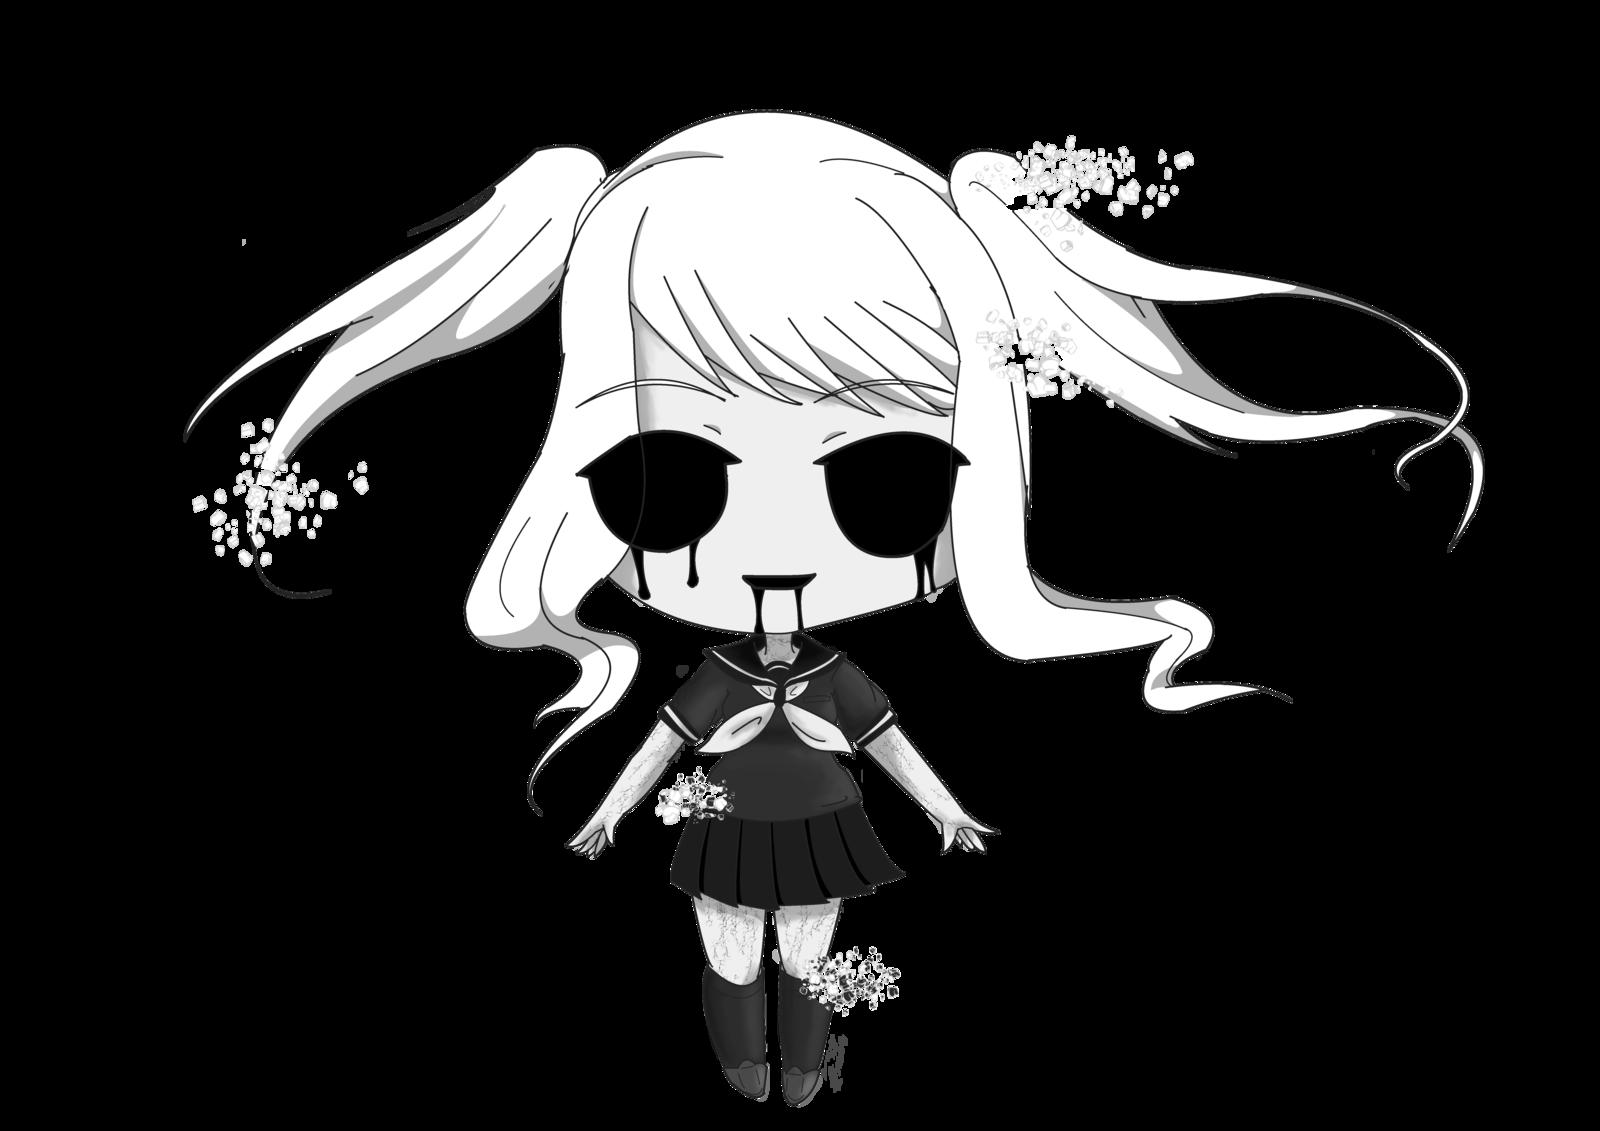 Chibi Fun Girl By HighLittleSky